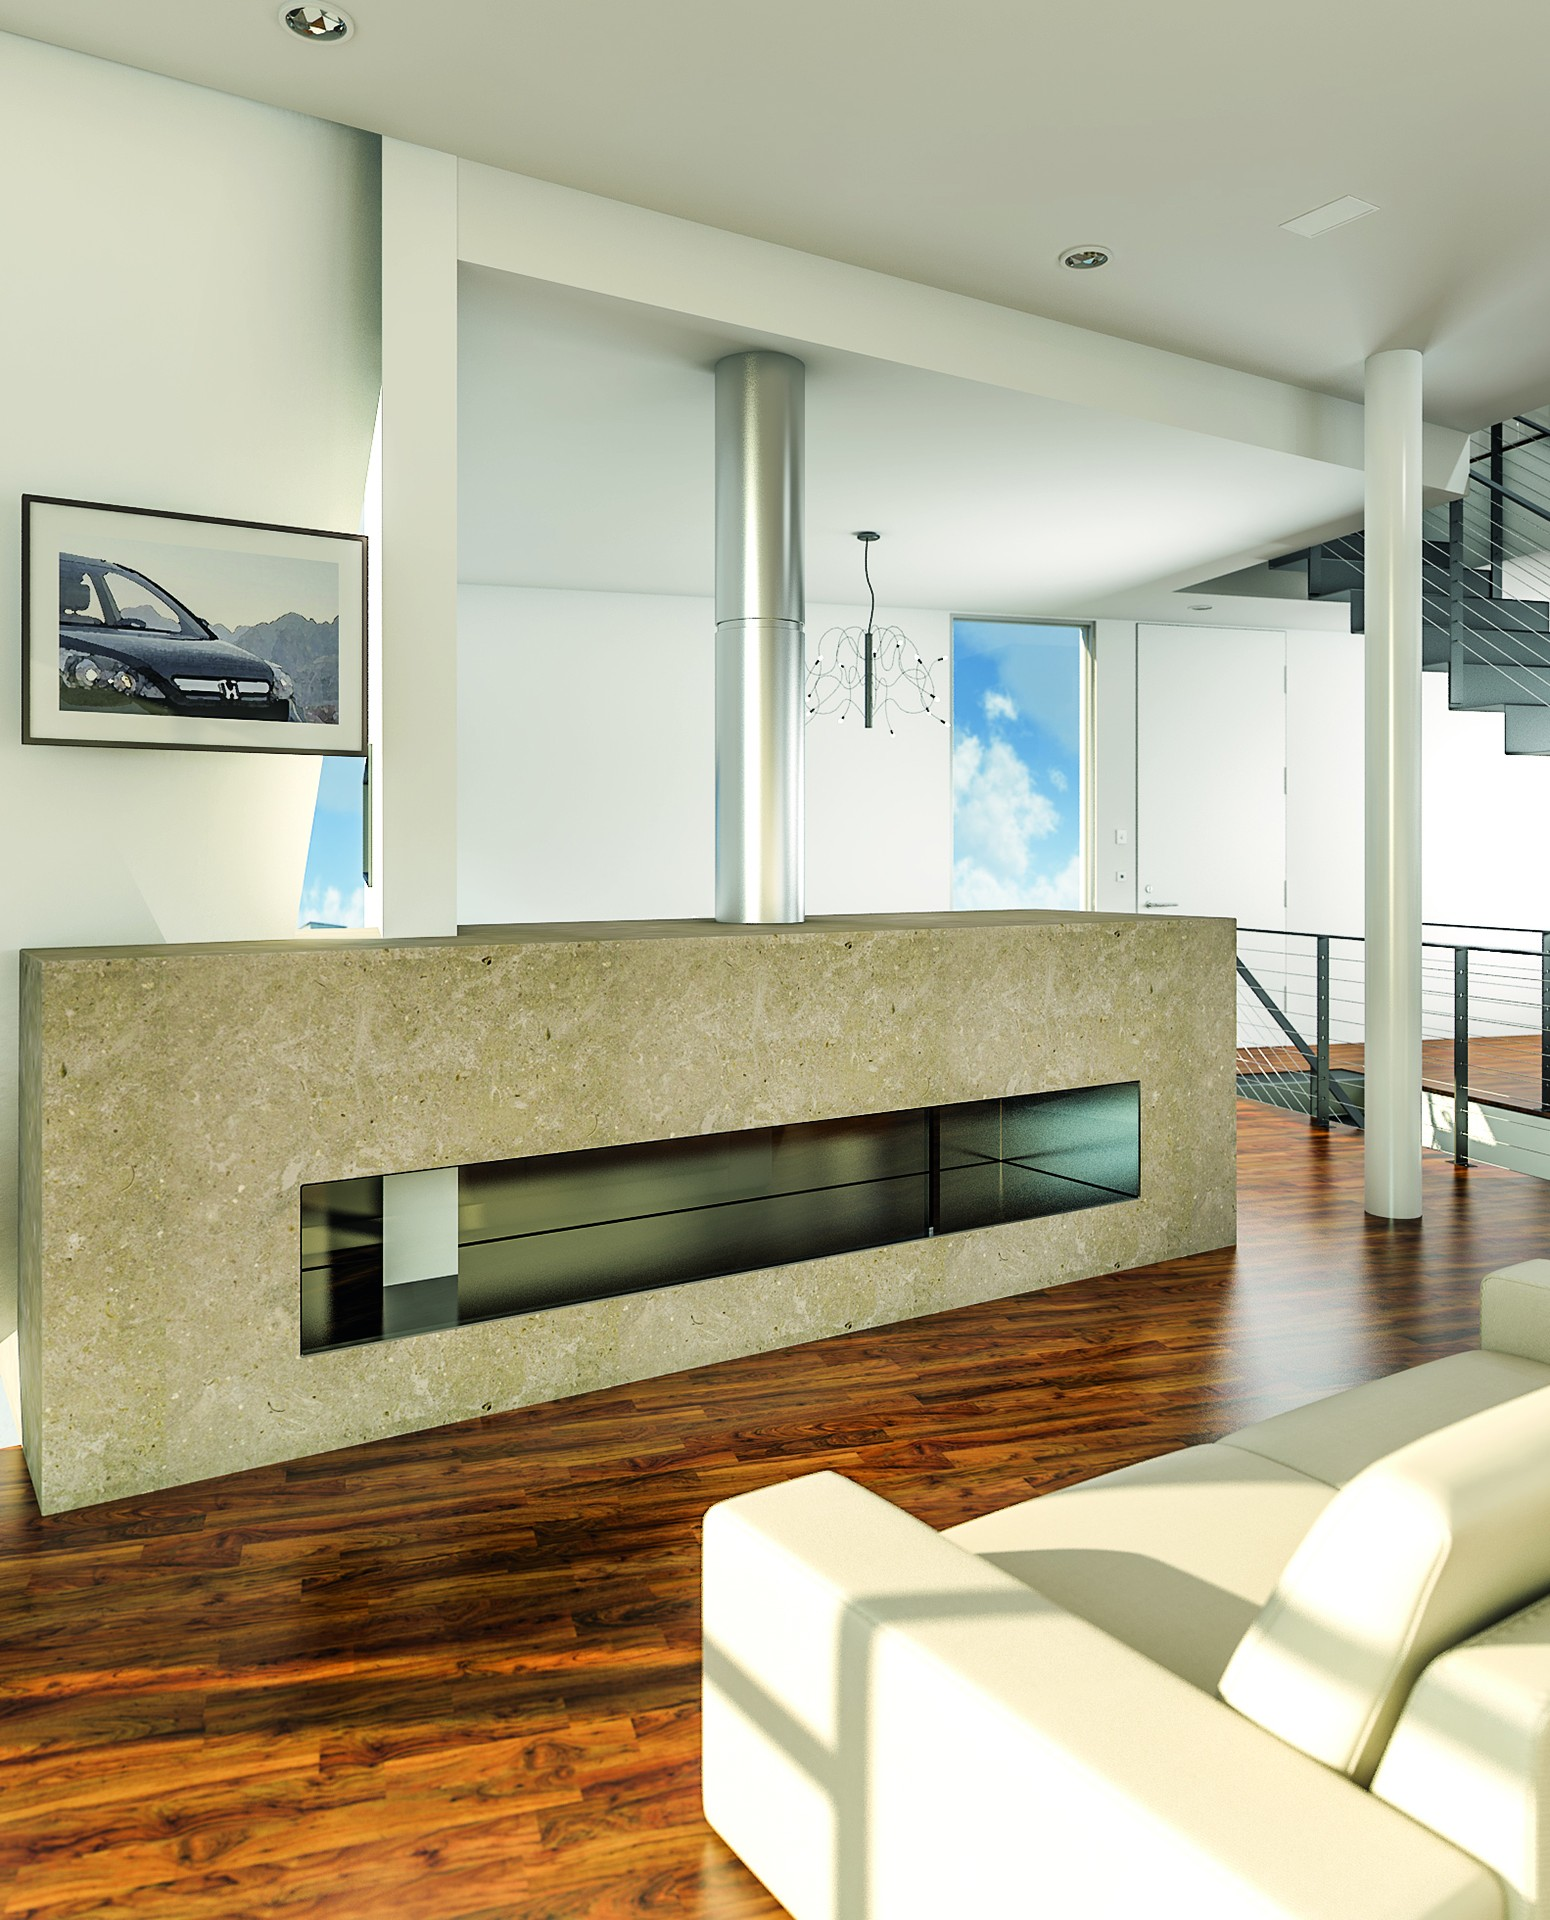 Fireplace limestone material